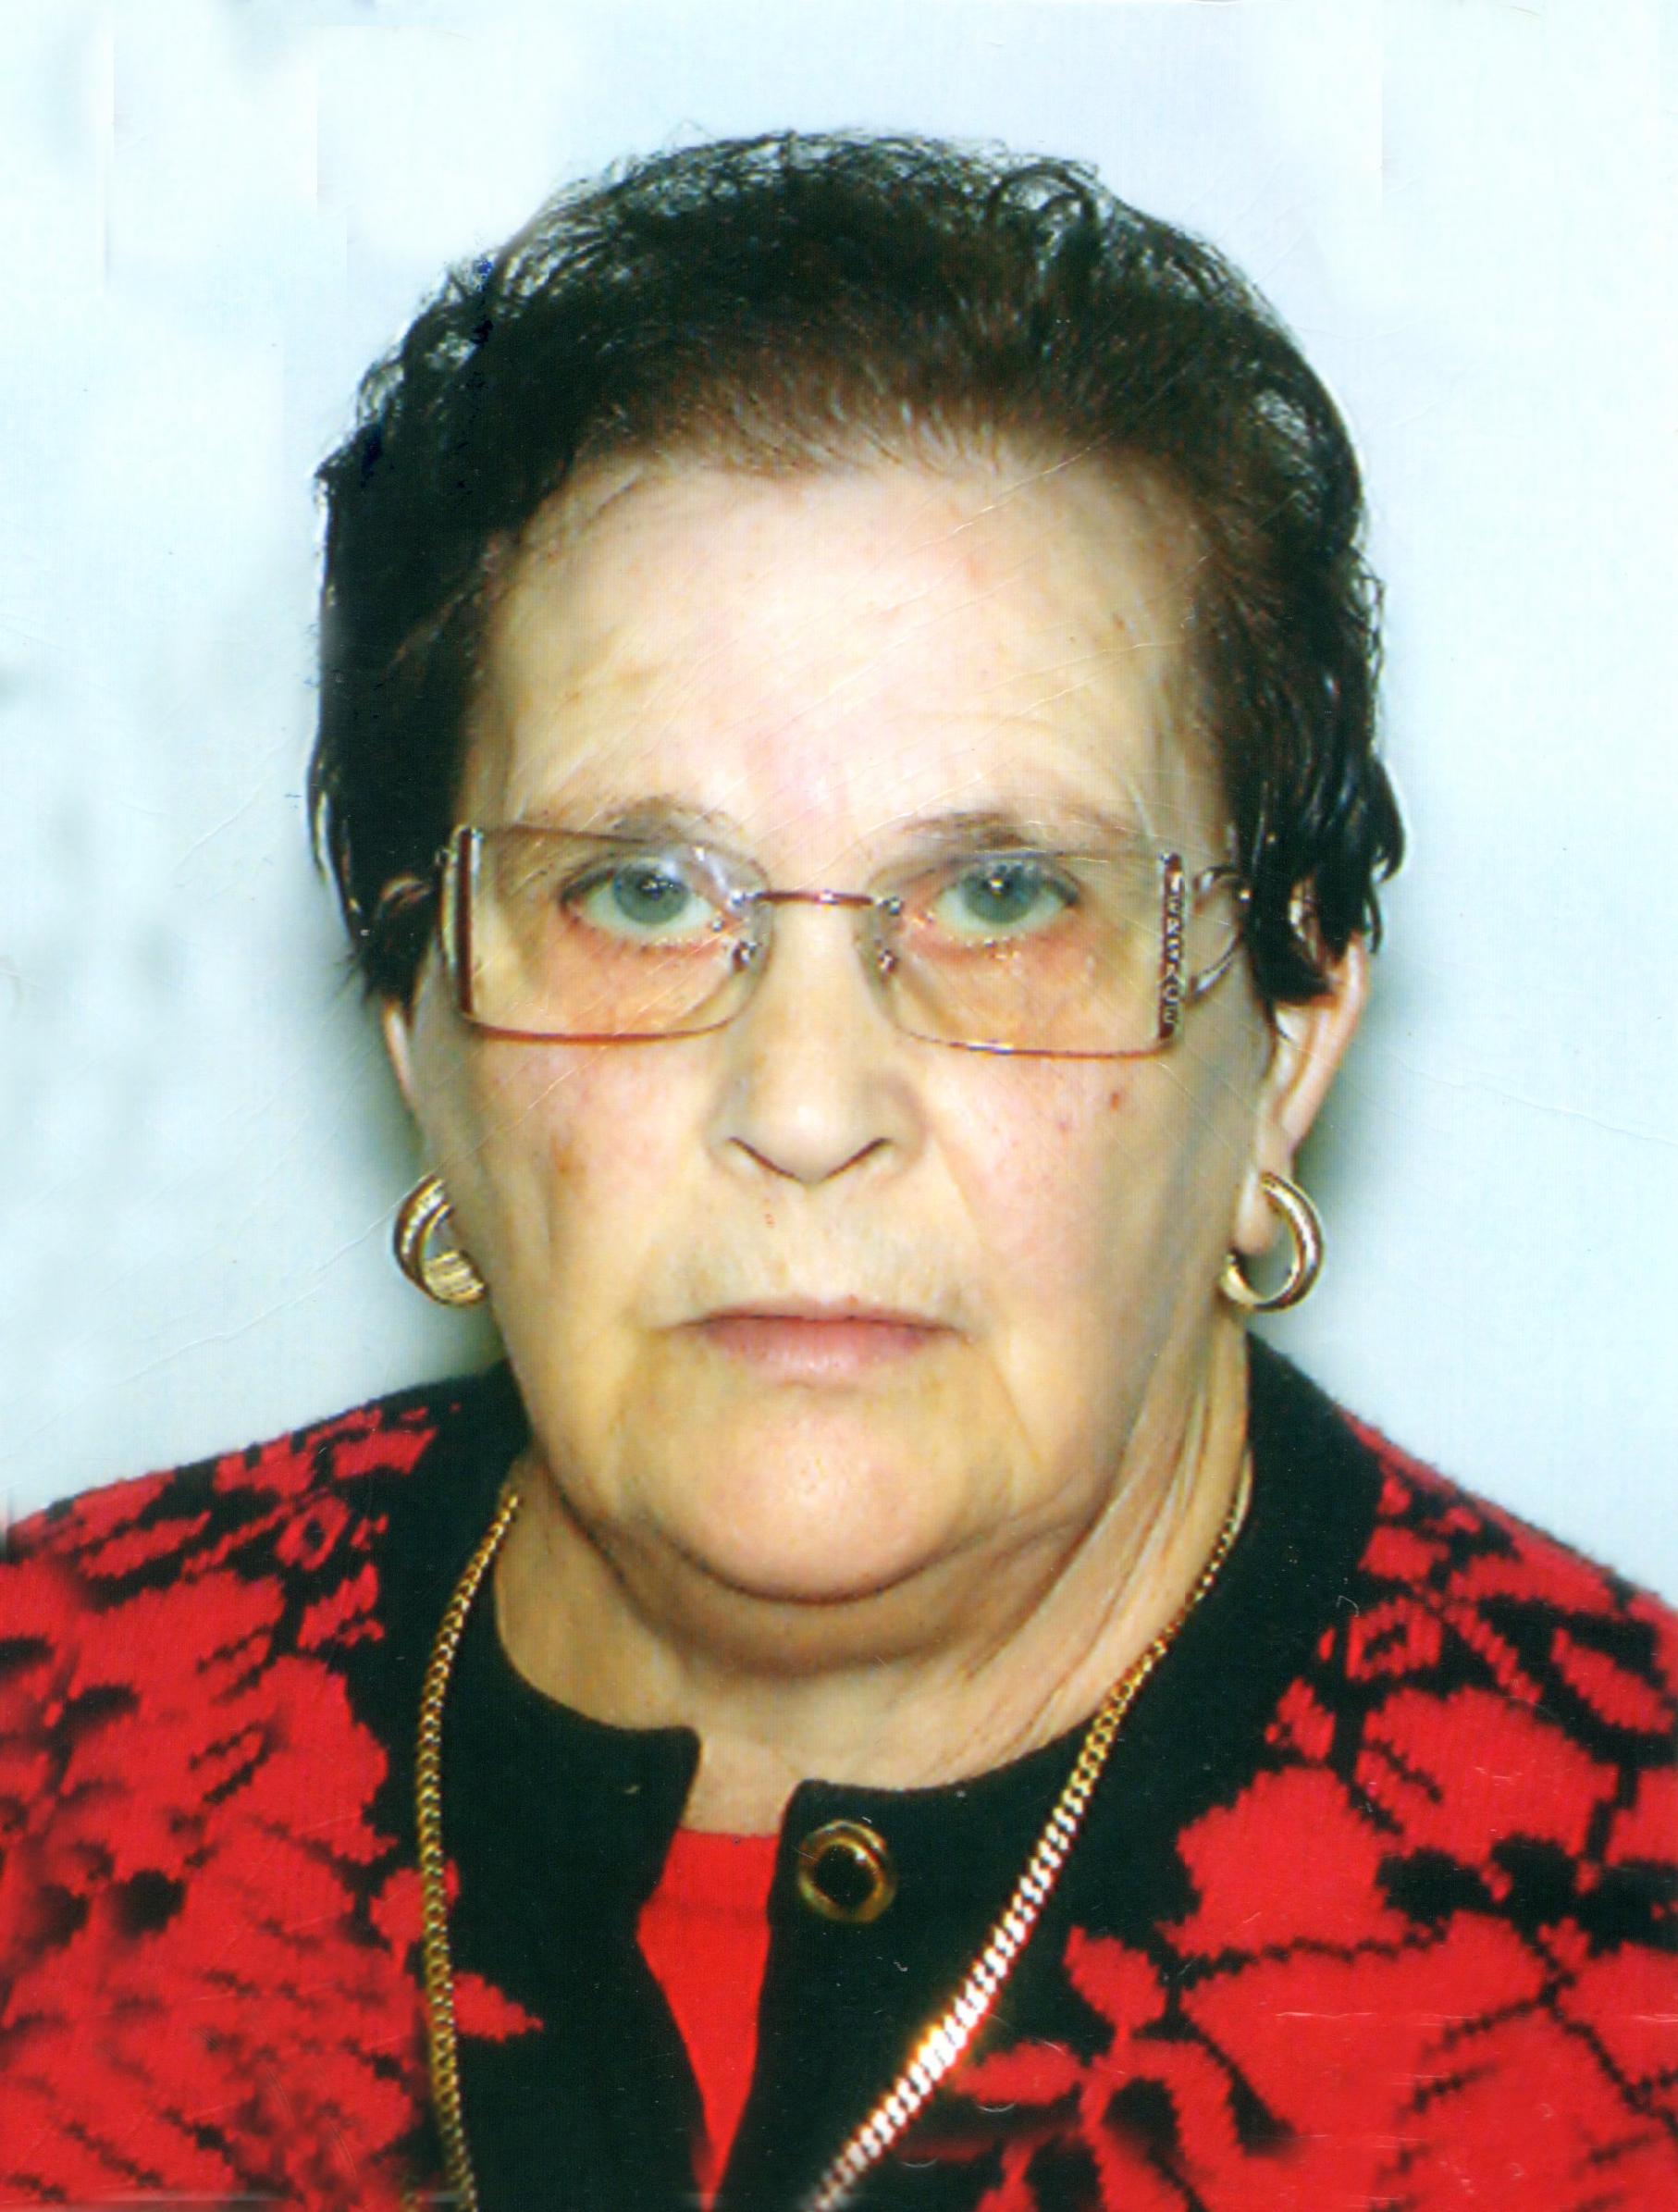 COLLURA MARIA TERESA